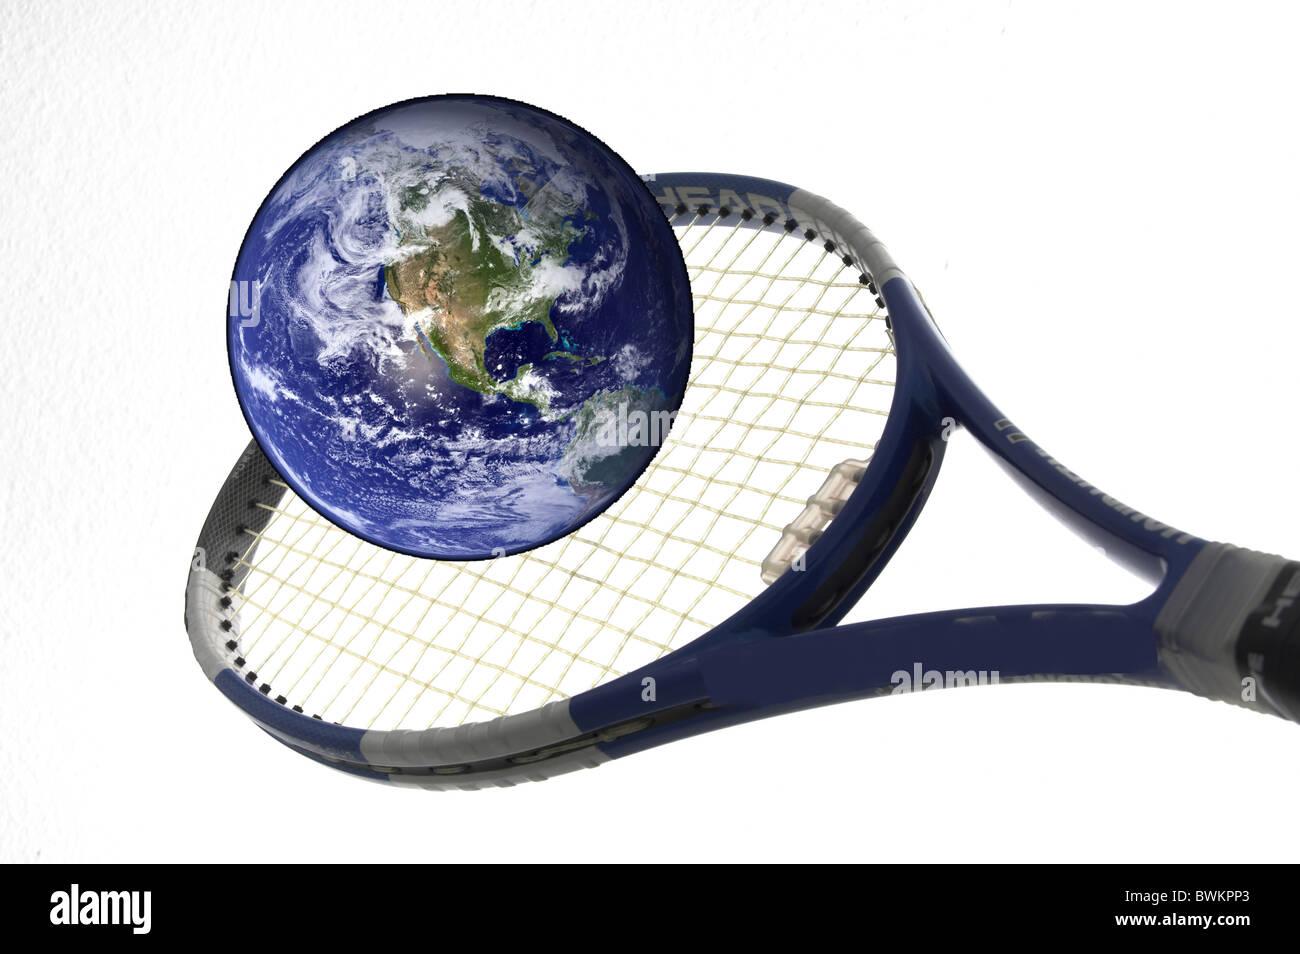 environment problem symbol earth globe globe draft plan ball tennis-ball carelessness match ball person h - Stock Image